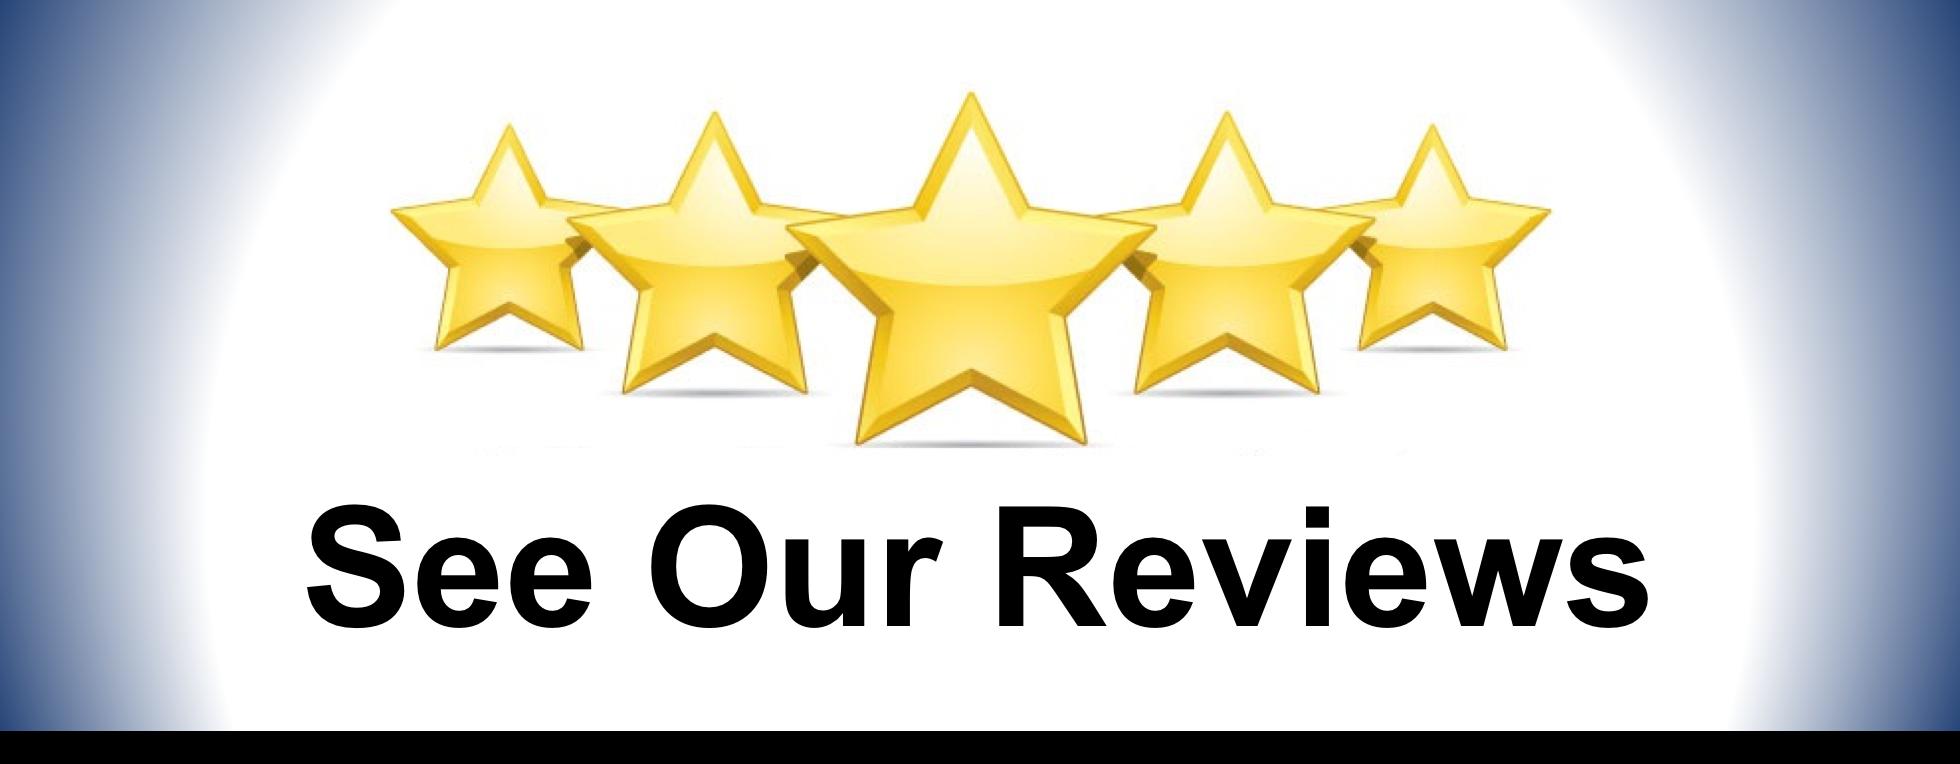 Children's Dentistry & Orthodontics of Lynchburg | Orthodontists at 105 Paulette Cir - Lynchburg VA - Reviews - Photos - Phone Number